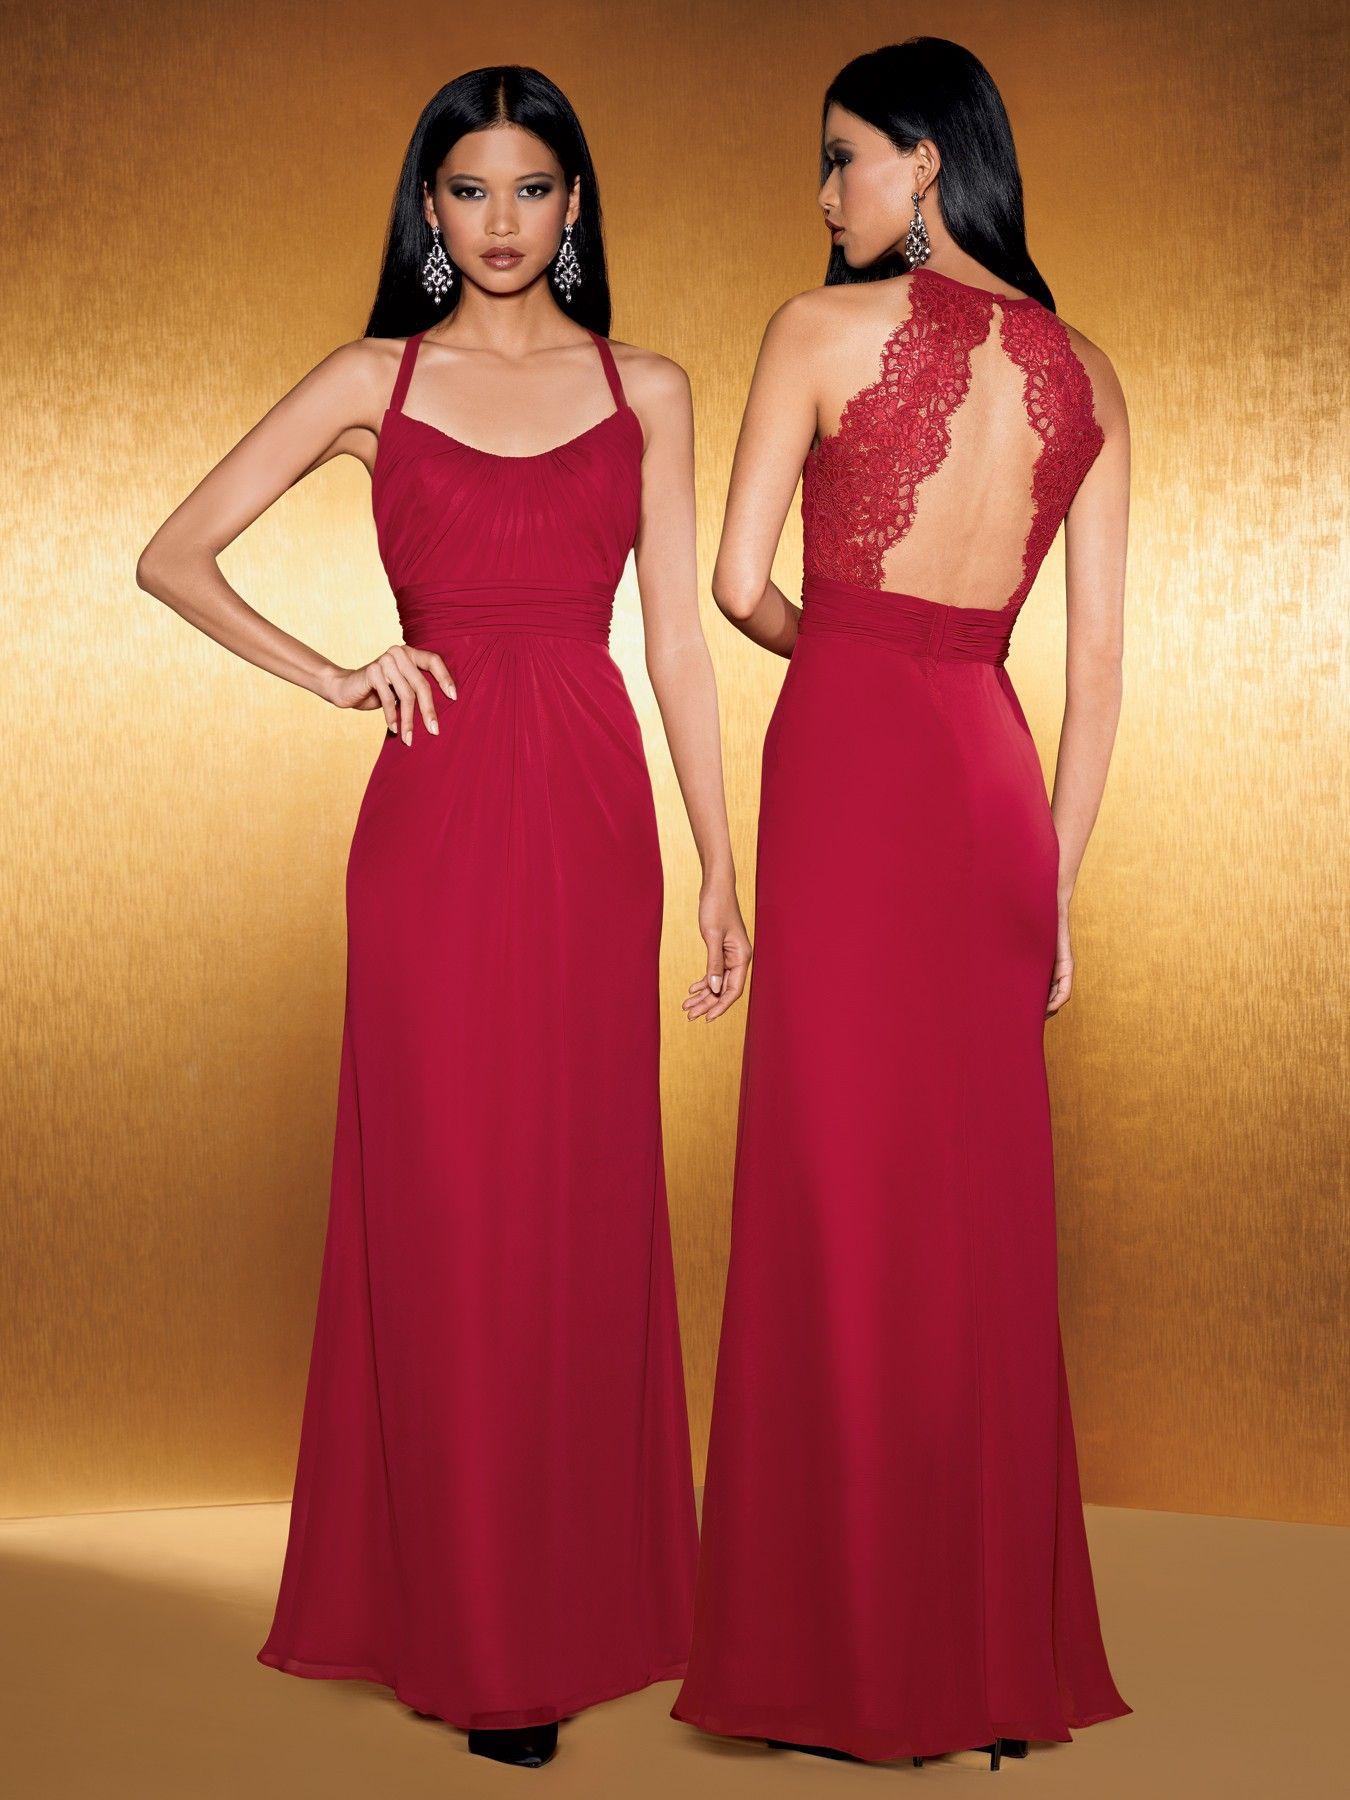 Jordan fashions red bridesmaid dress style 1000 fluted chiffon jordan fashions red bridesmaid dress style 1000 fluted chiffon gown with draped skirt and ombrellifo Choice Image